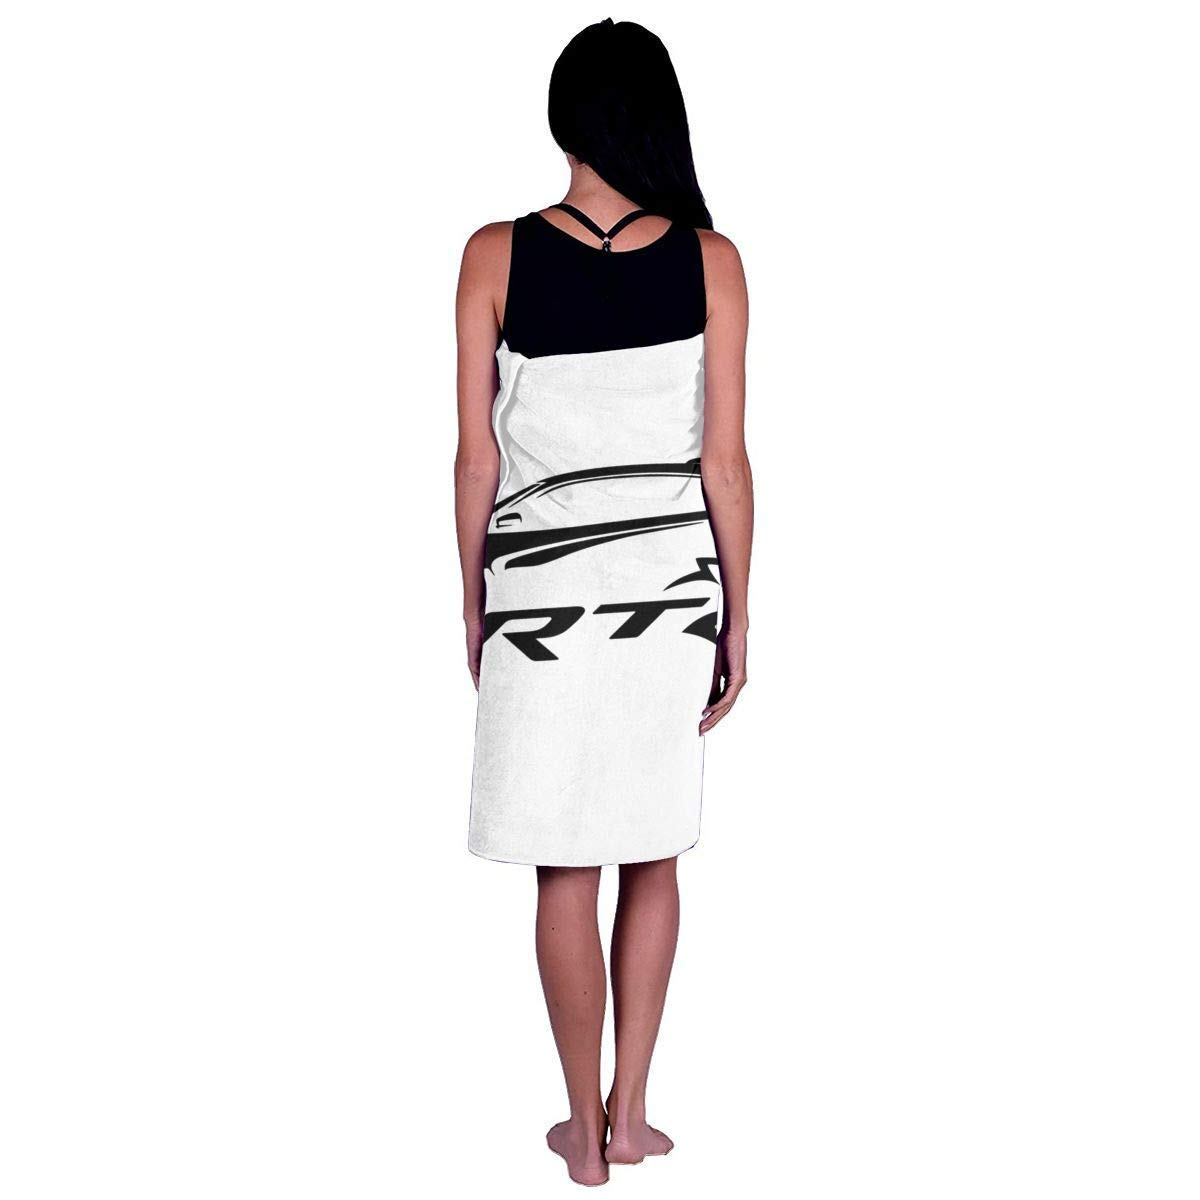 Estrellas Orientales Serie Final 2018 2019 Print Design Microfiber Beach Towel